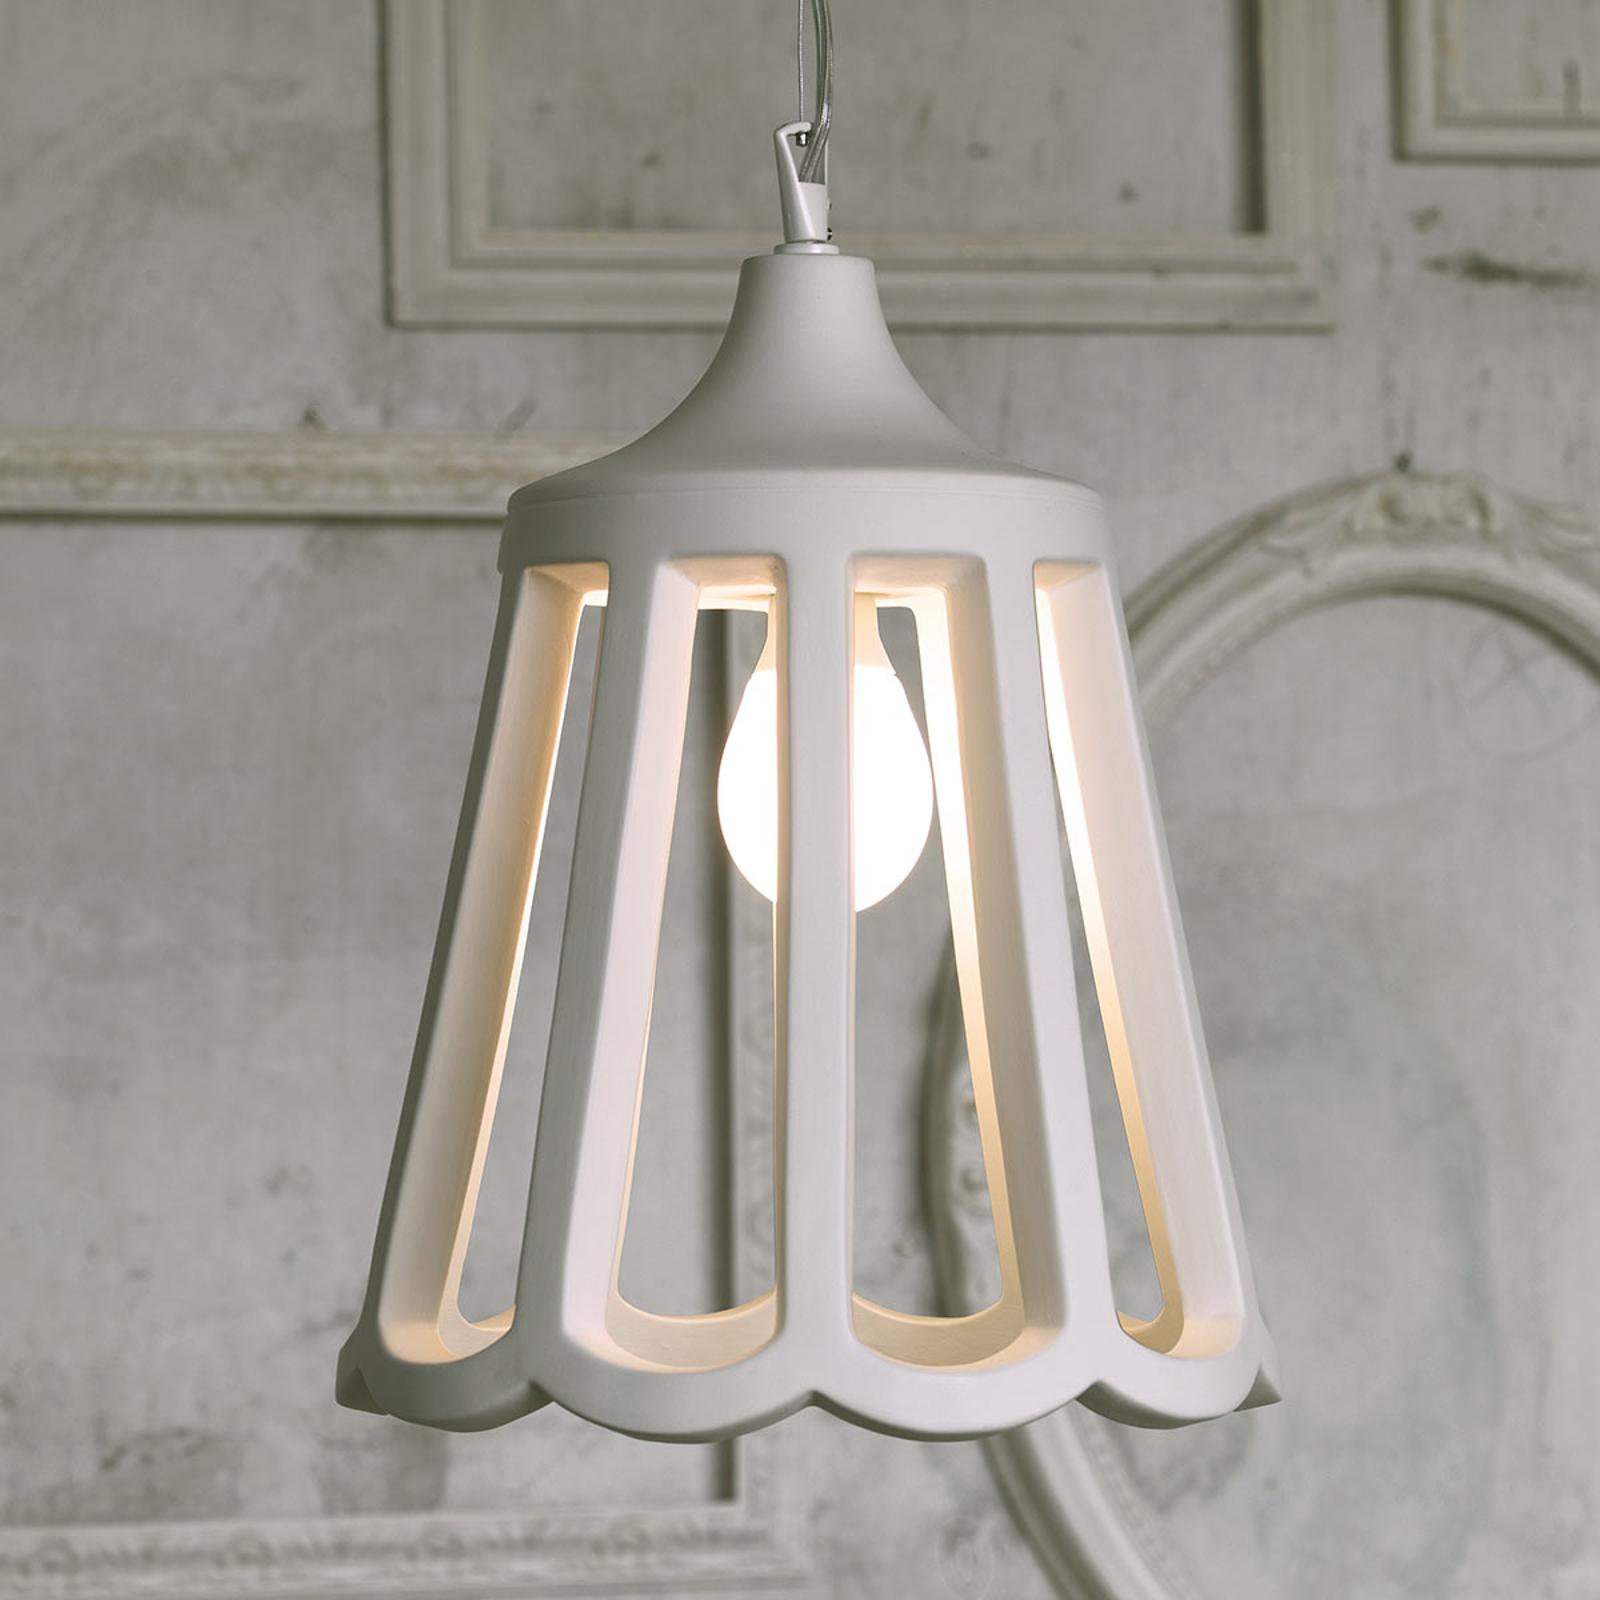 Karman Le Pupette, hængelampe i keramik, 30 cm